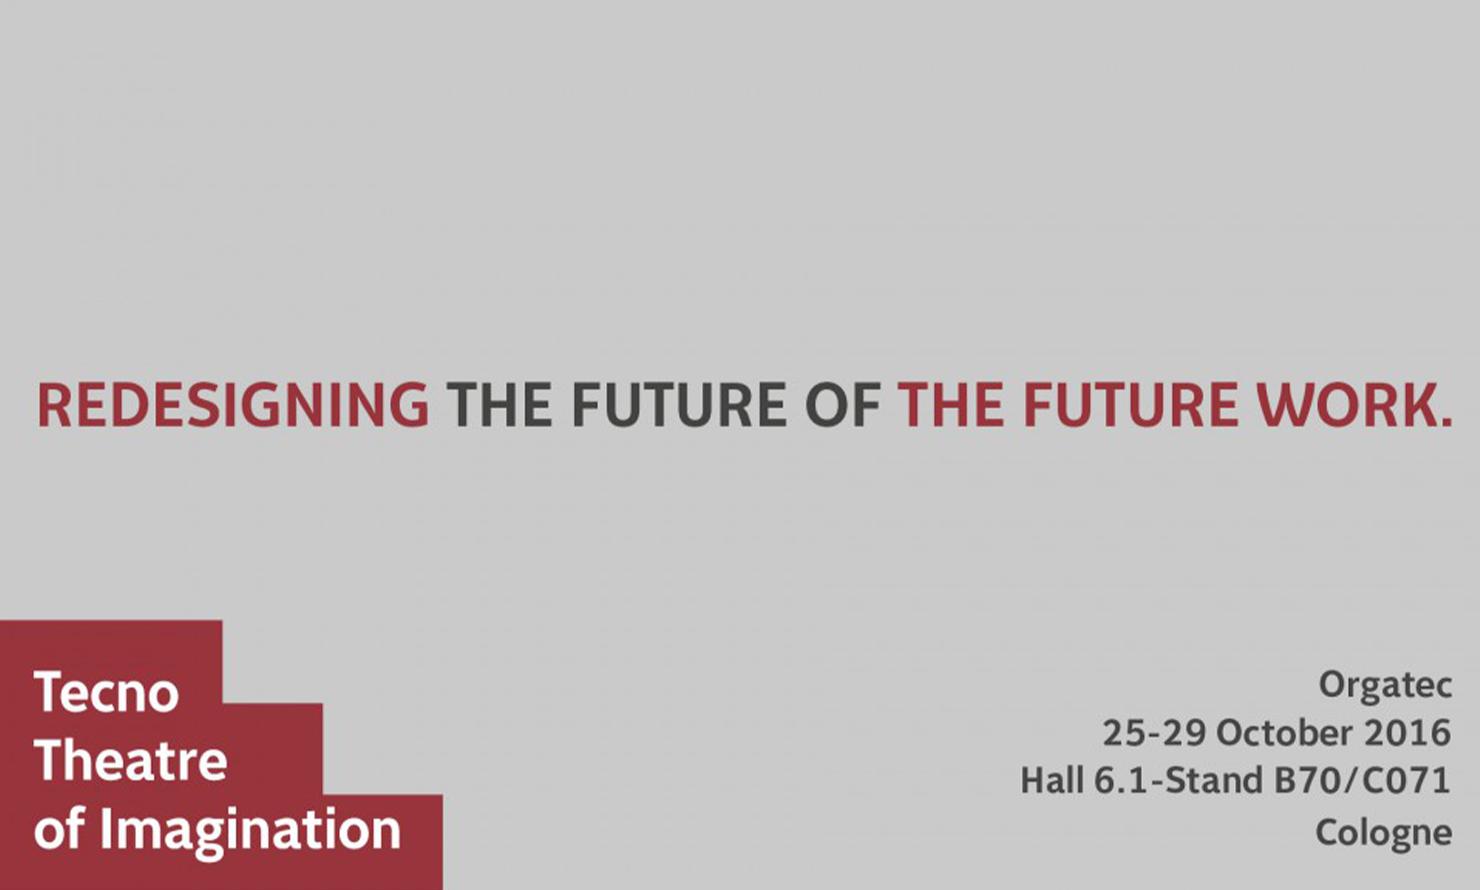 https://www.kubelibre.com/uploads/Slider-work-tutti-clienti/tecno-redesigning-the-future-of-the-future-of-work-9.jpg